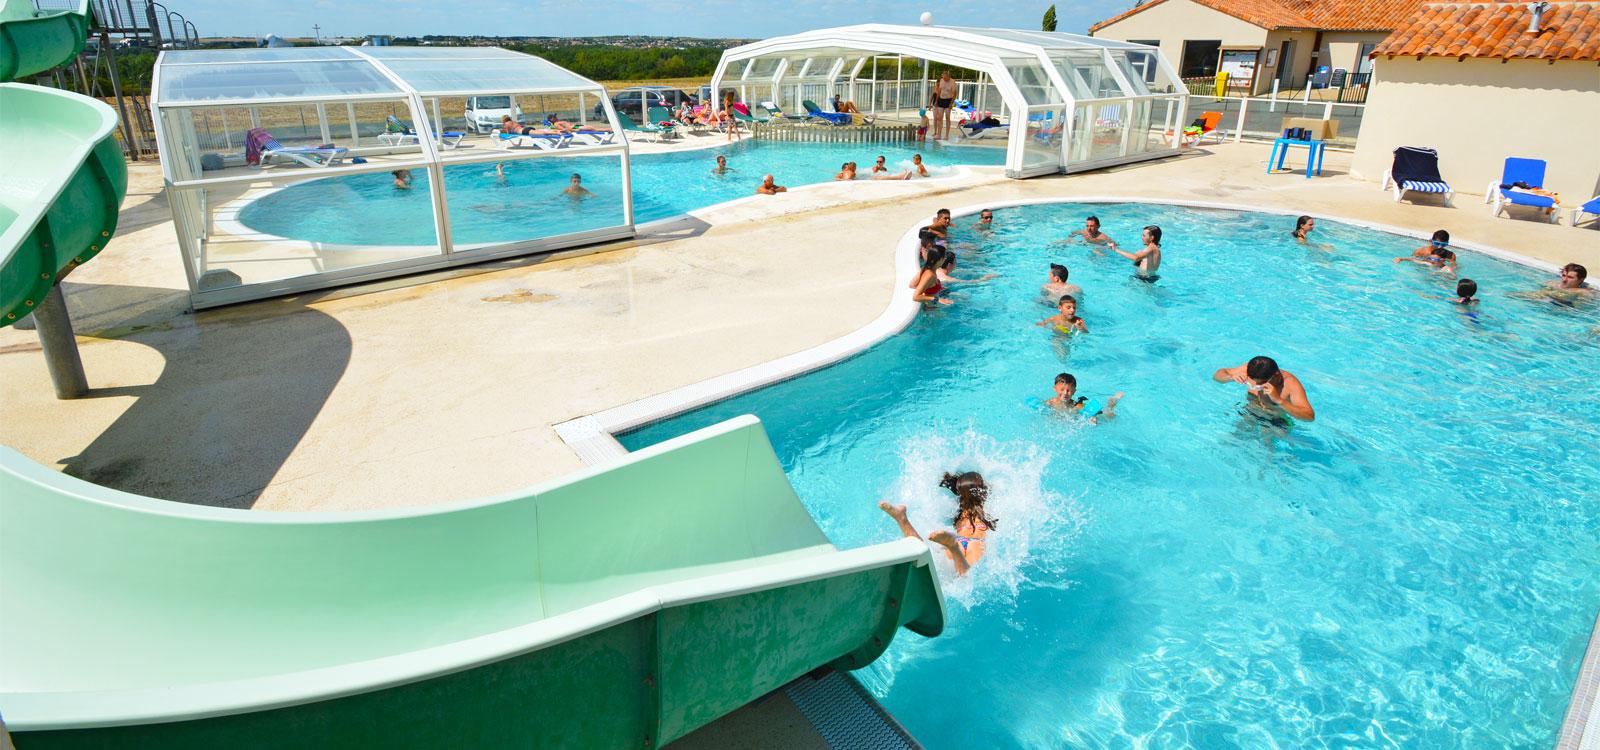 Camping le futuriste camping futuroscope accueil for Constructeur piscine poitiers